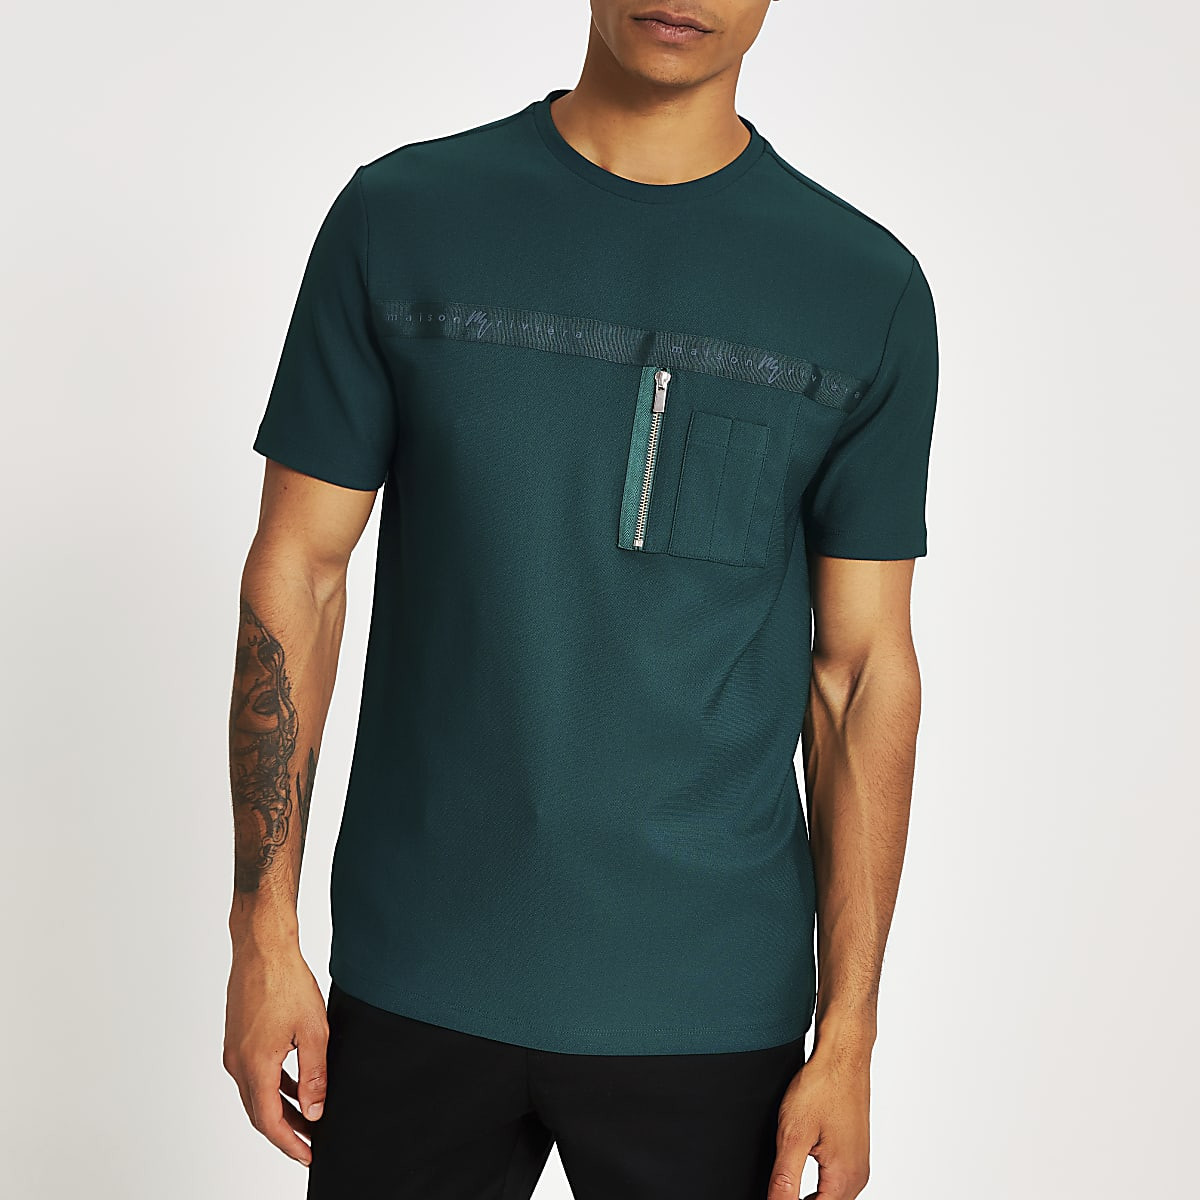 Maison Riviera - Groen slim-fit utility T-shirt